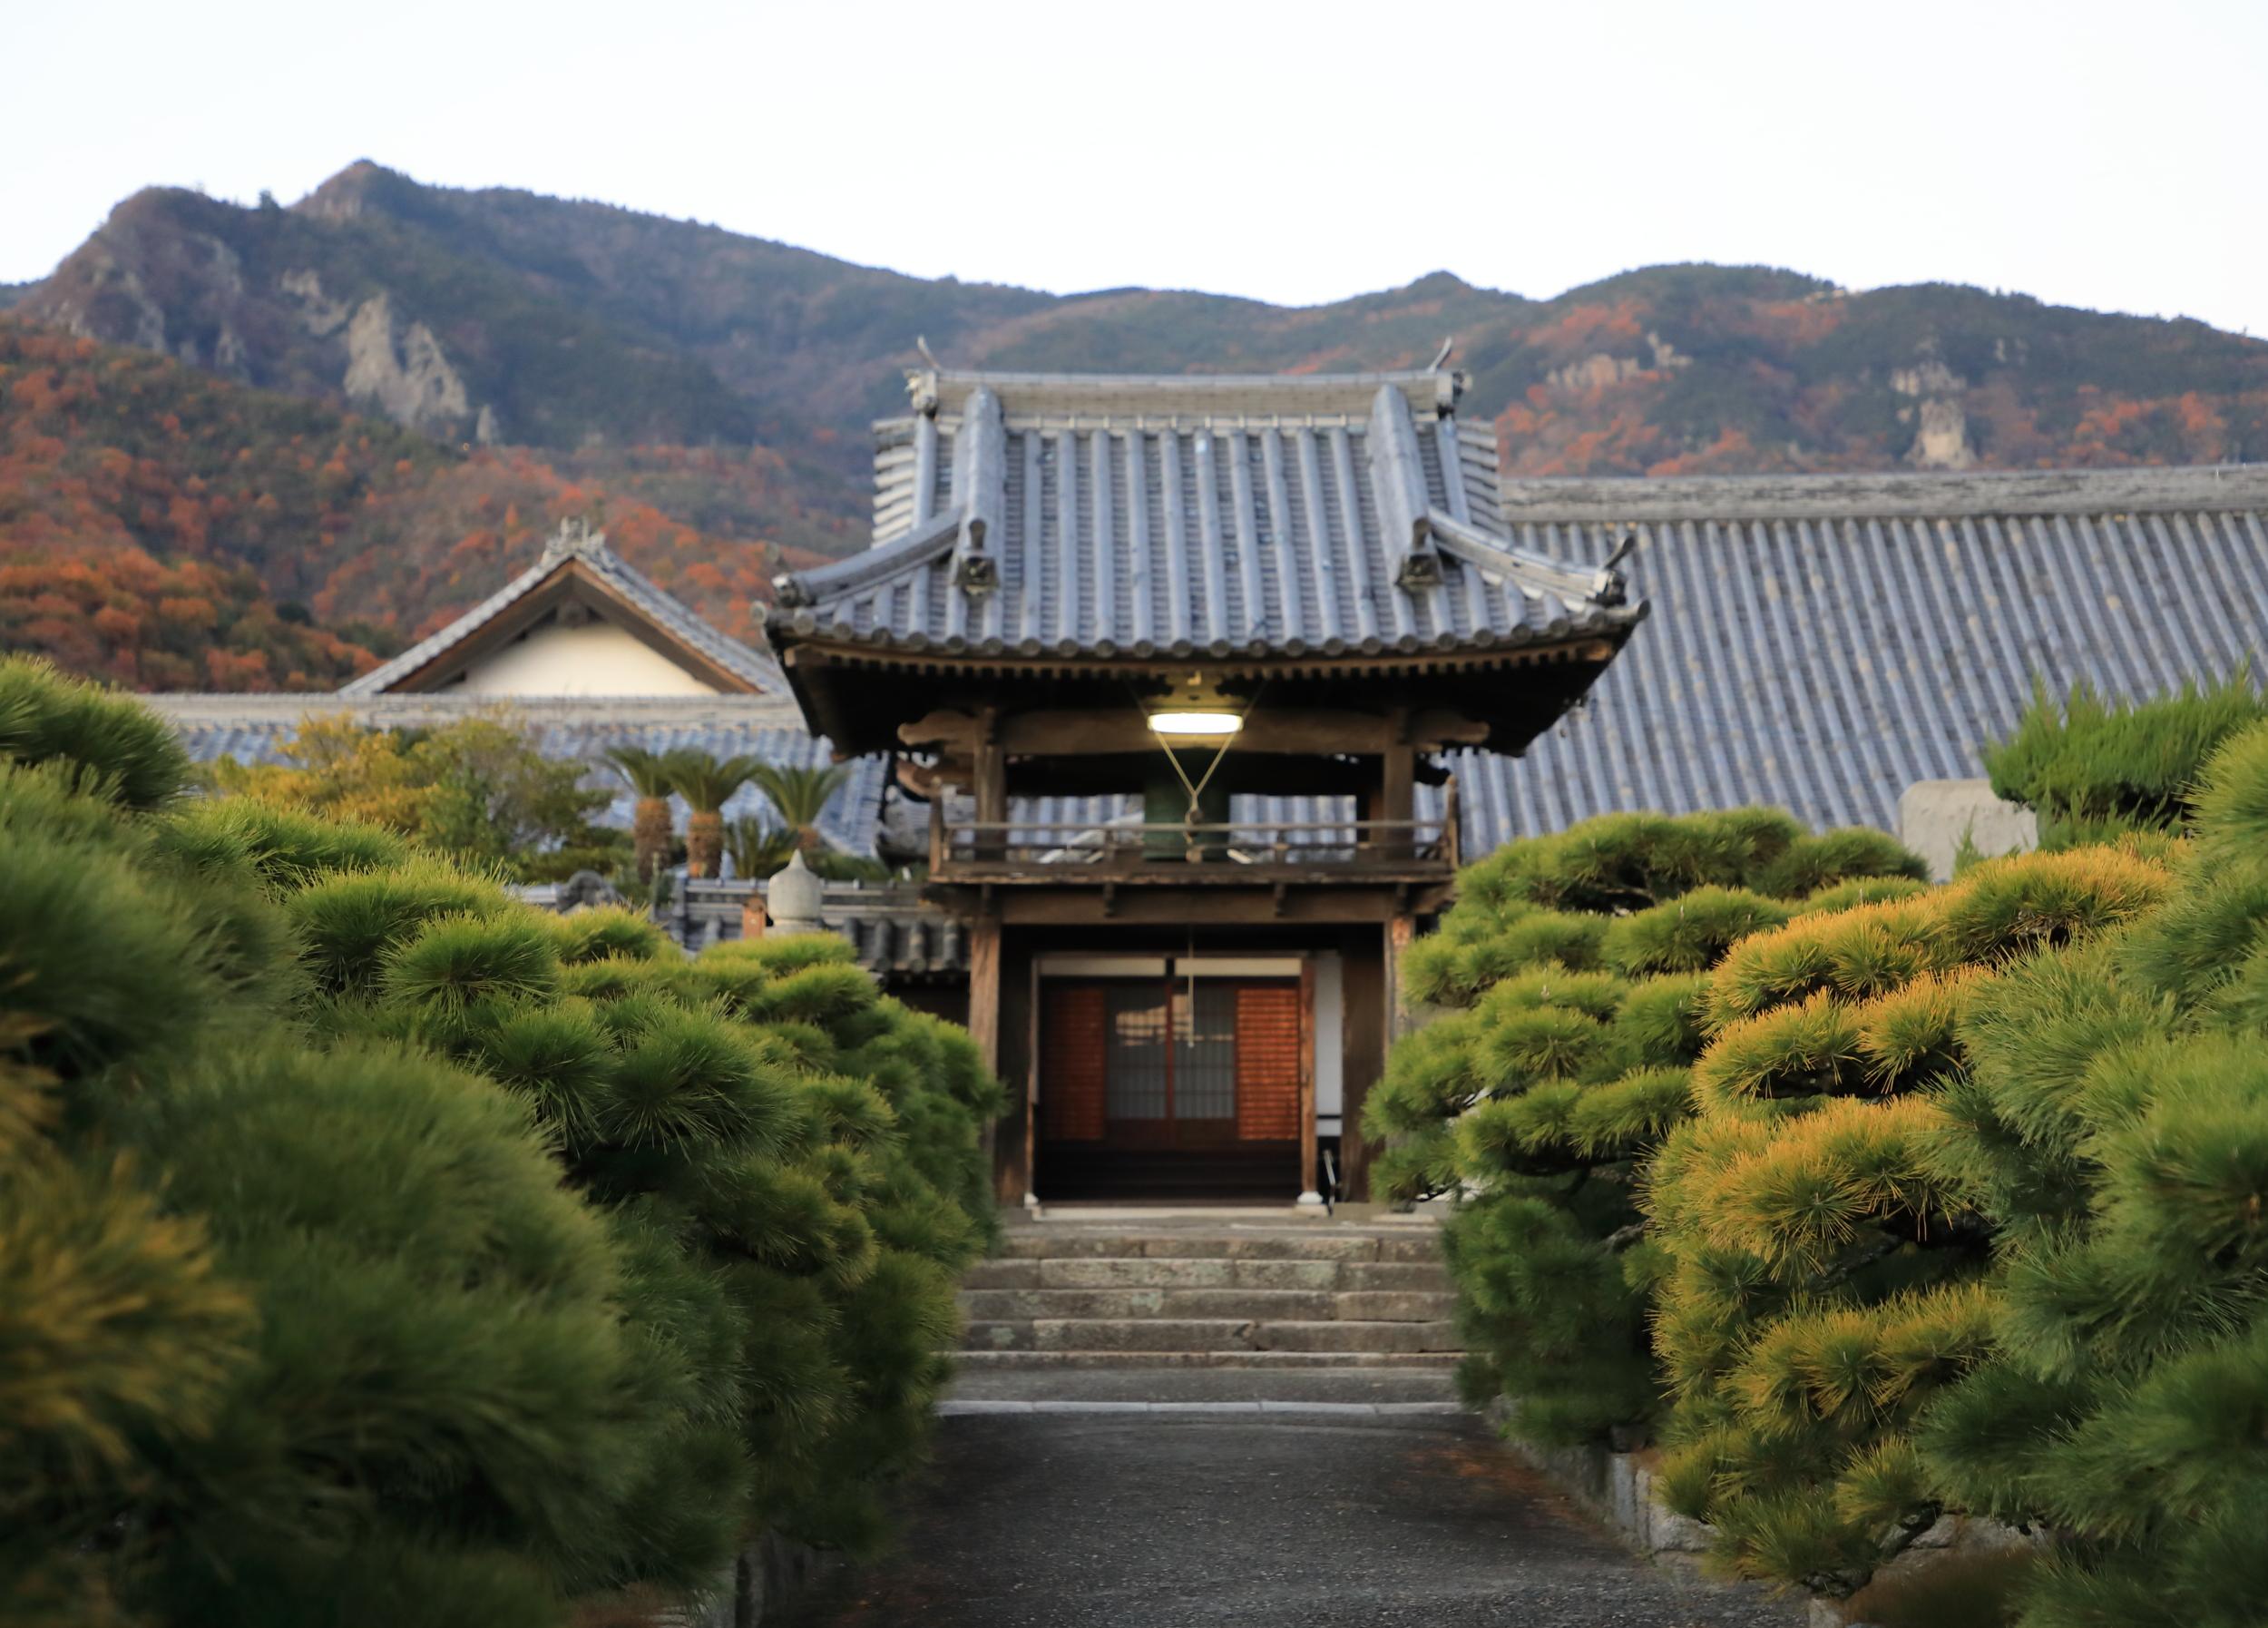 Eikoji Temple located near the Yamaroku soy sauce brewery with Mount Senbagagoku in the distance.